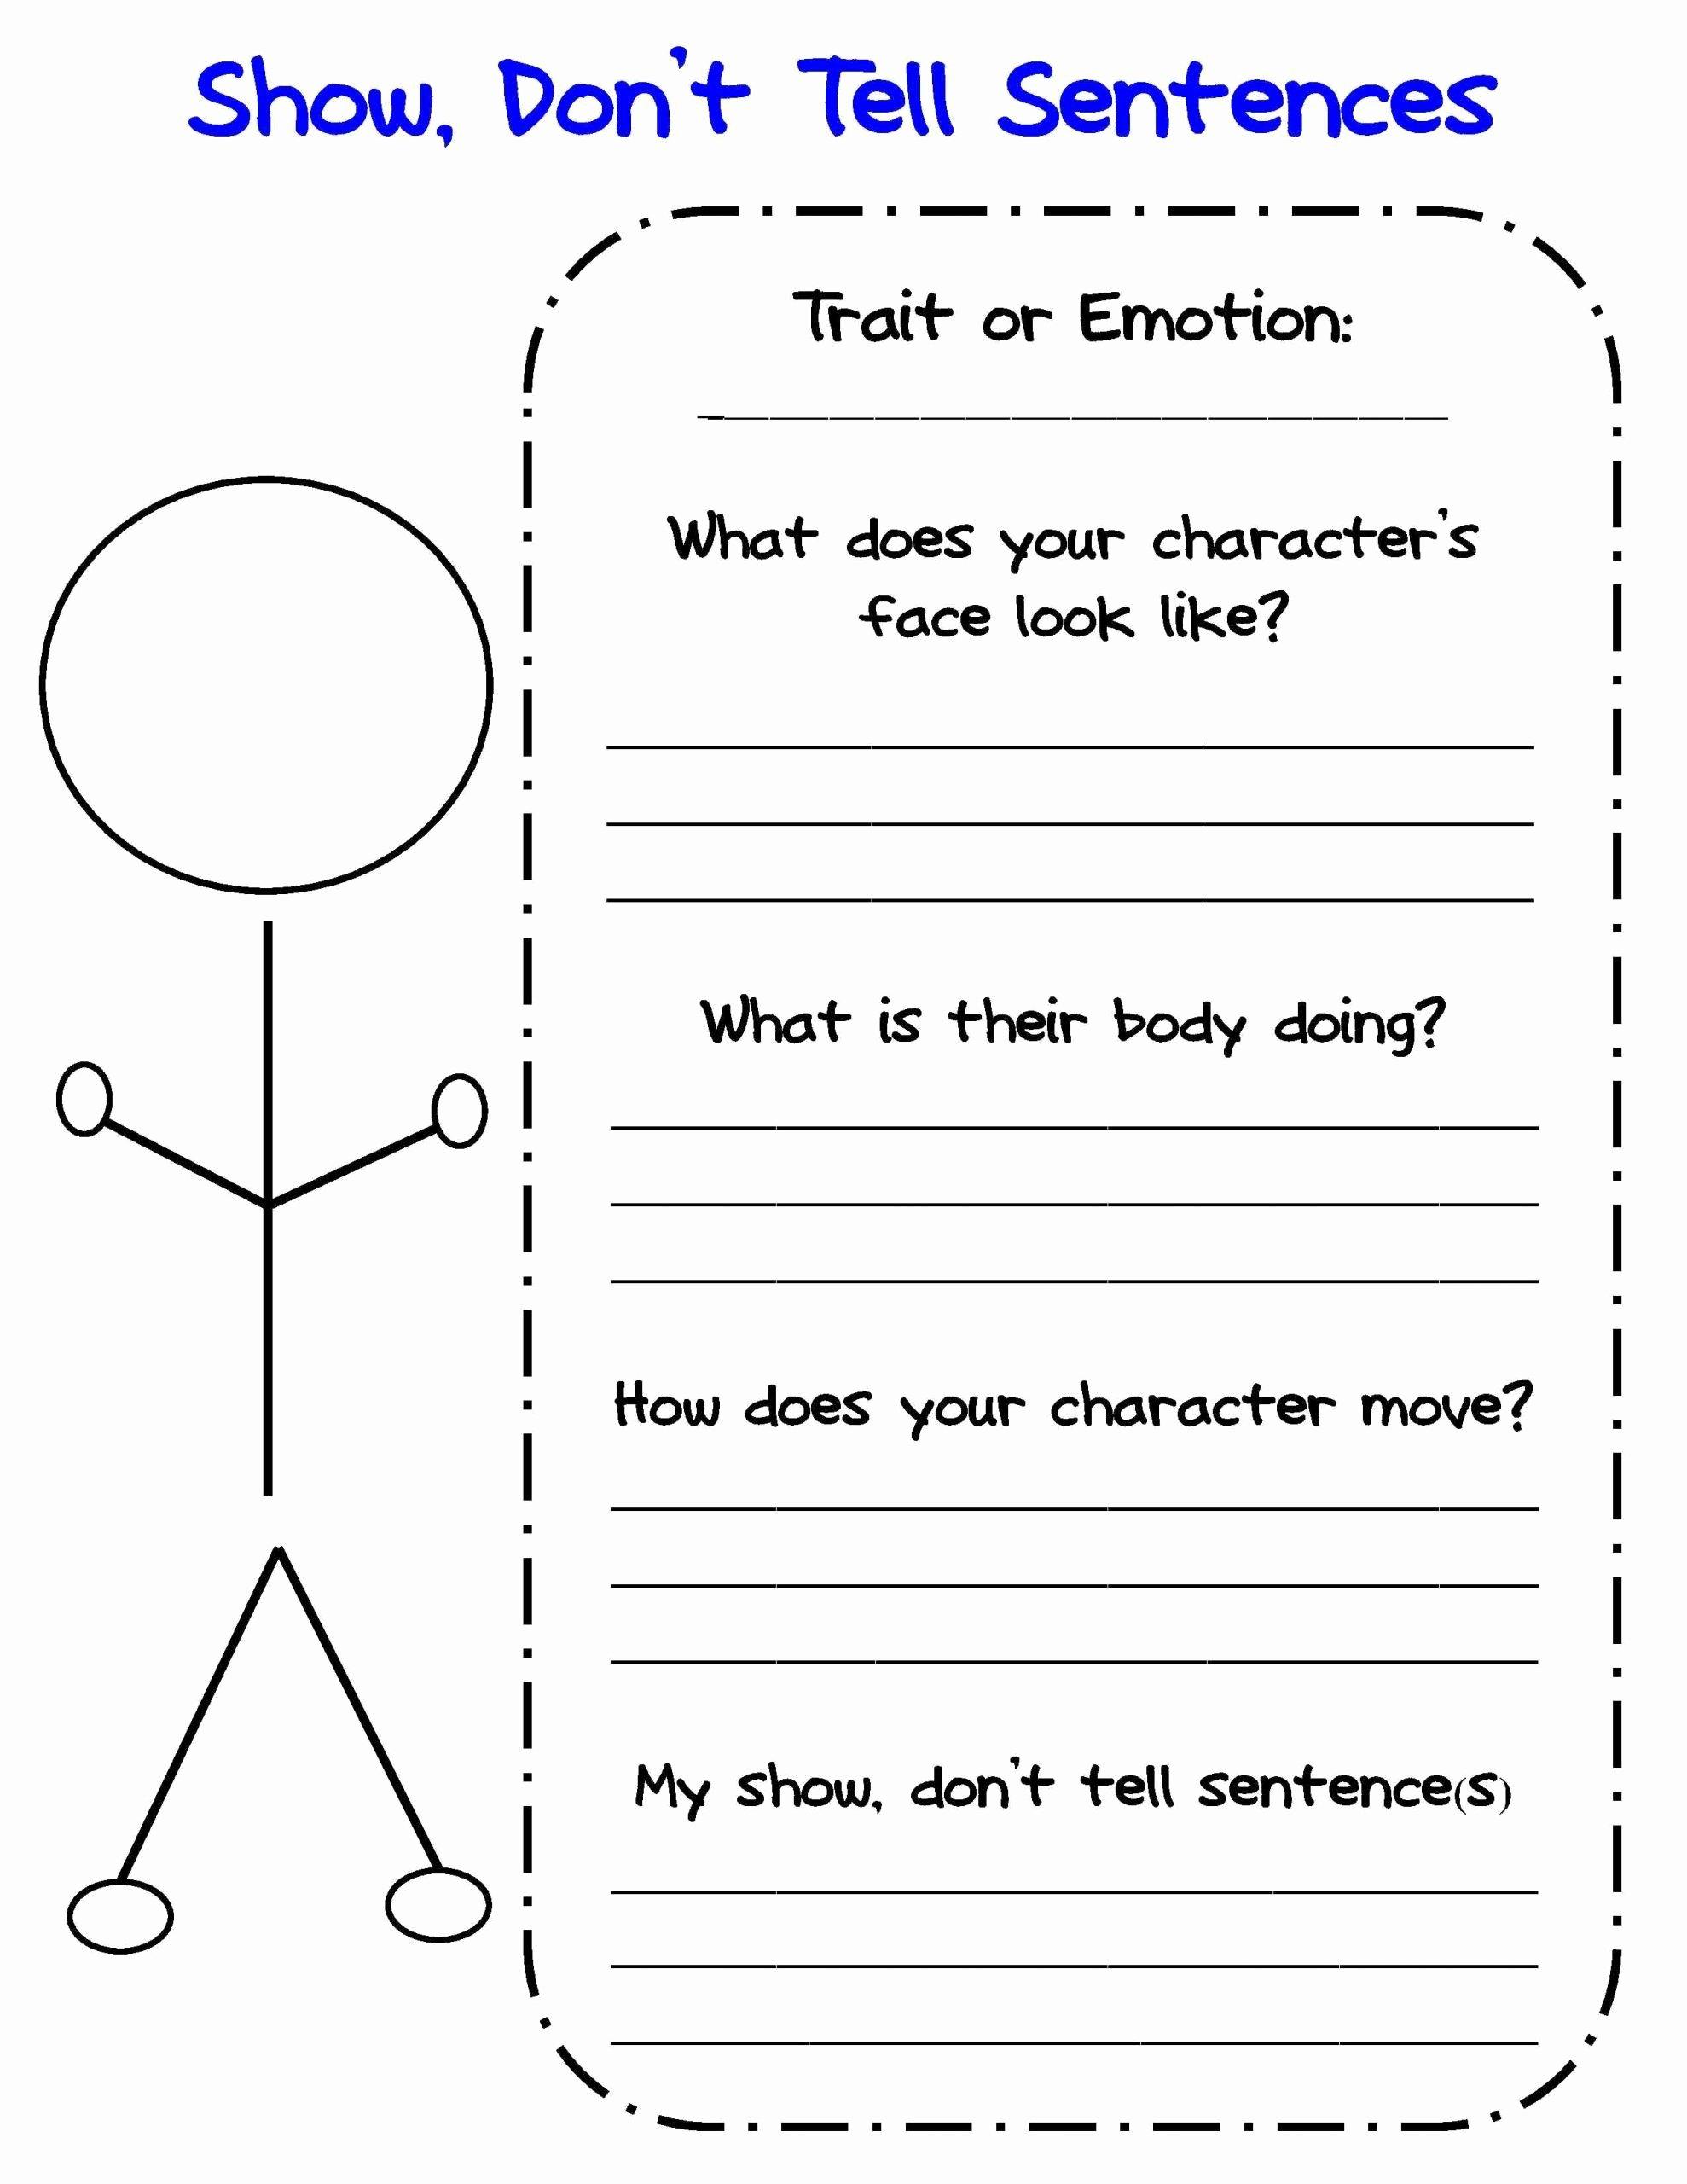 Character Analysis Worksheet High School New Character Analysis Worksheet High School In 2020